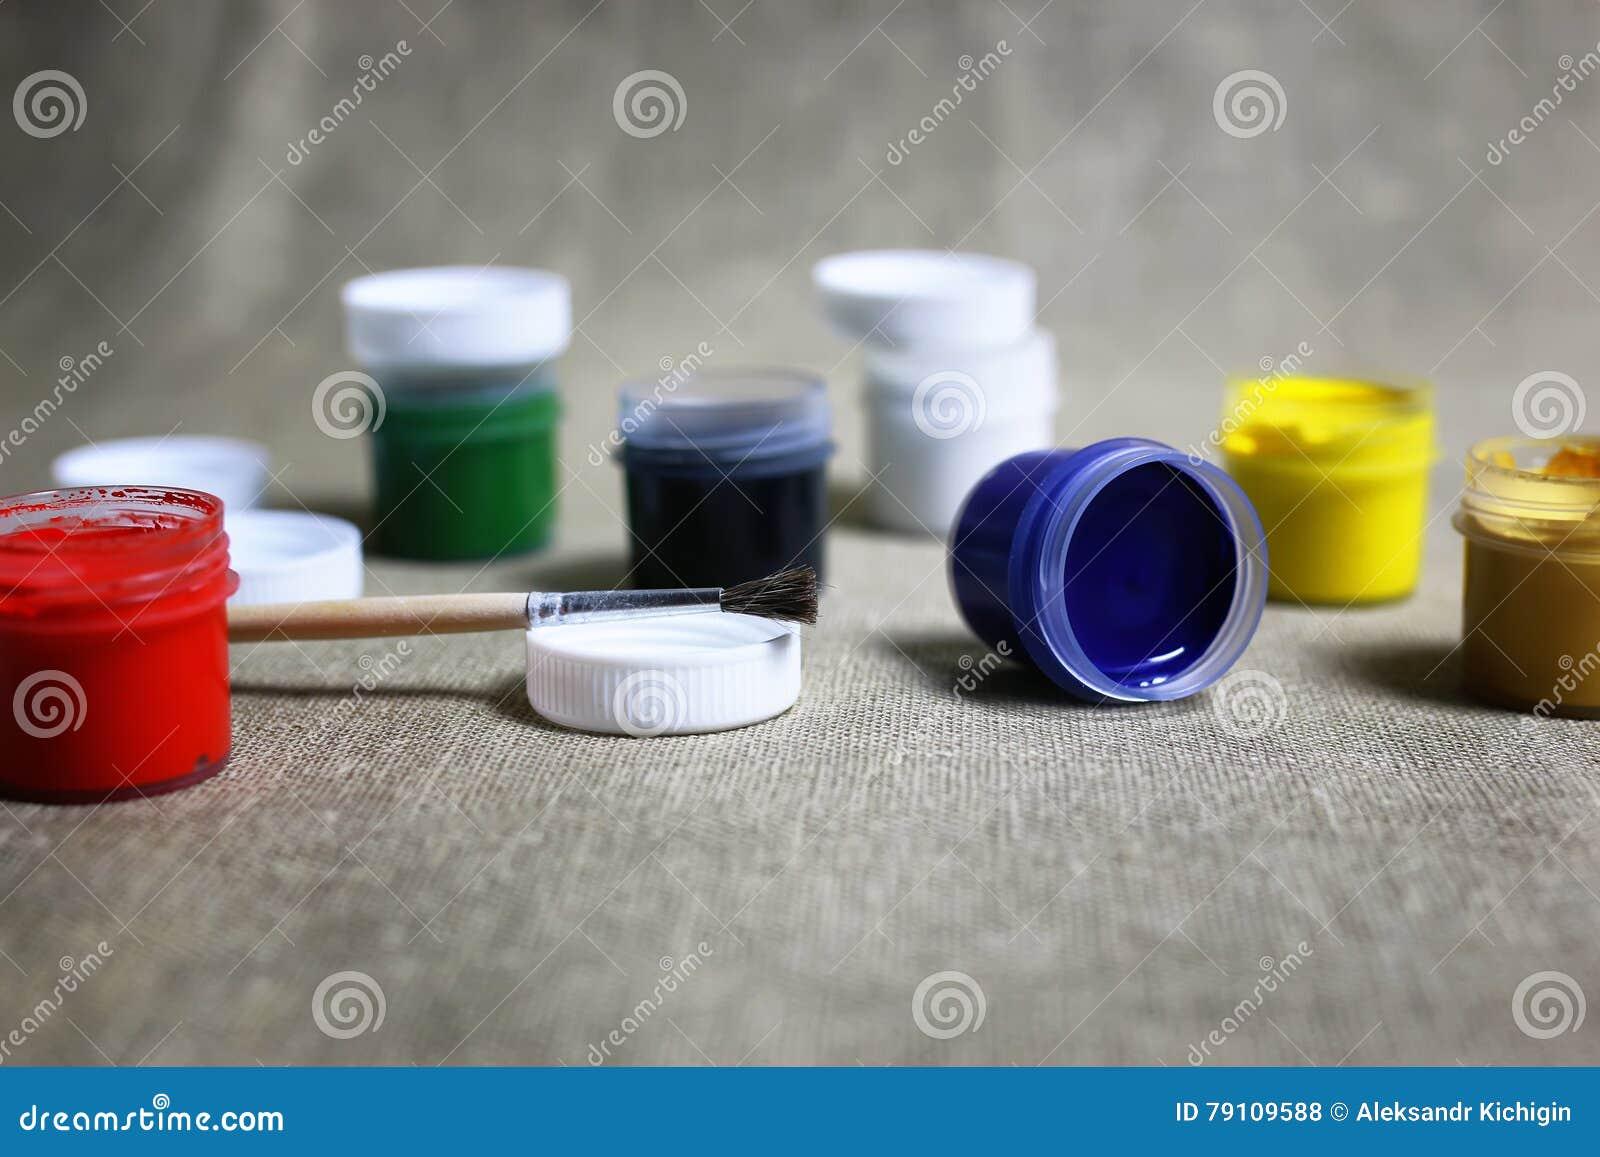 Set of paint cans